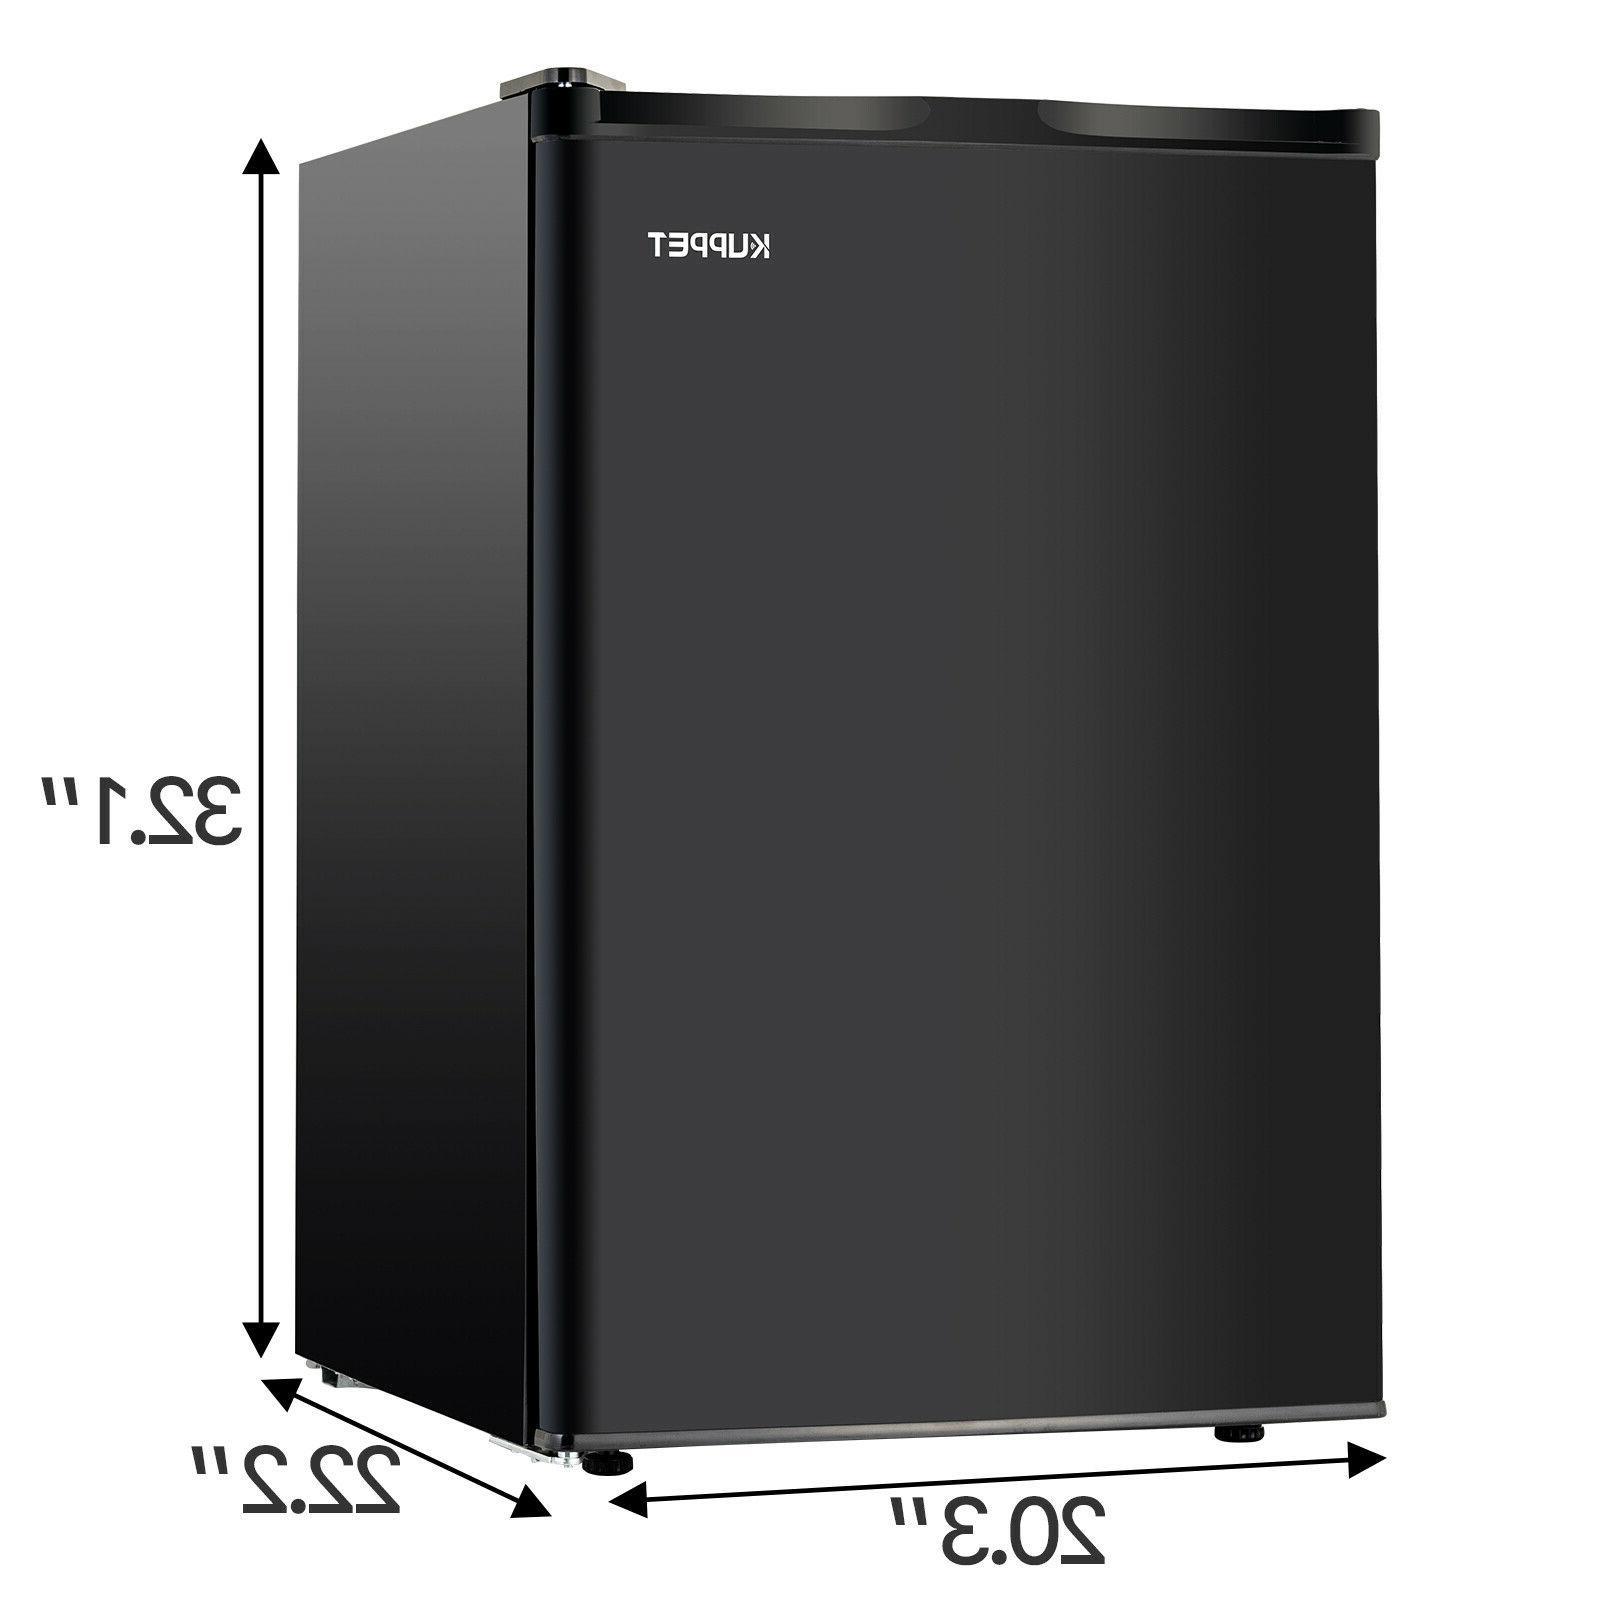 4.6 Fridge w/ Top Refrigerator Freestanding